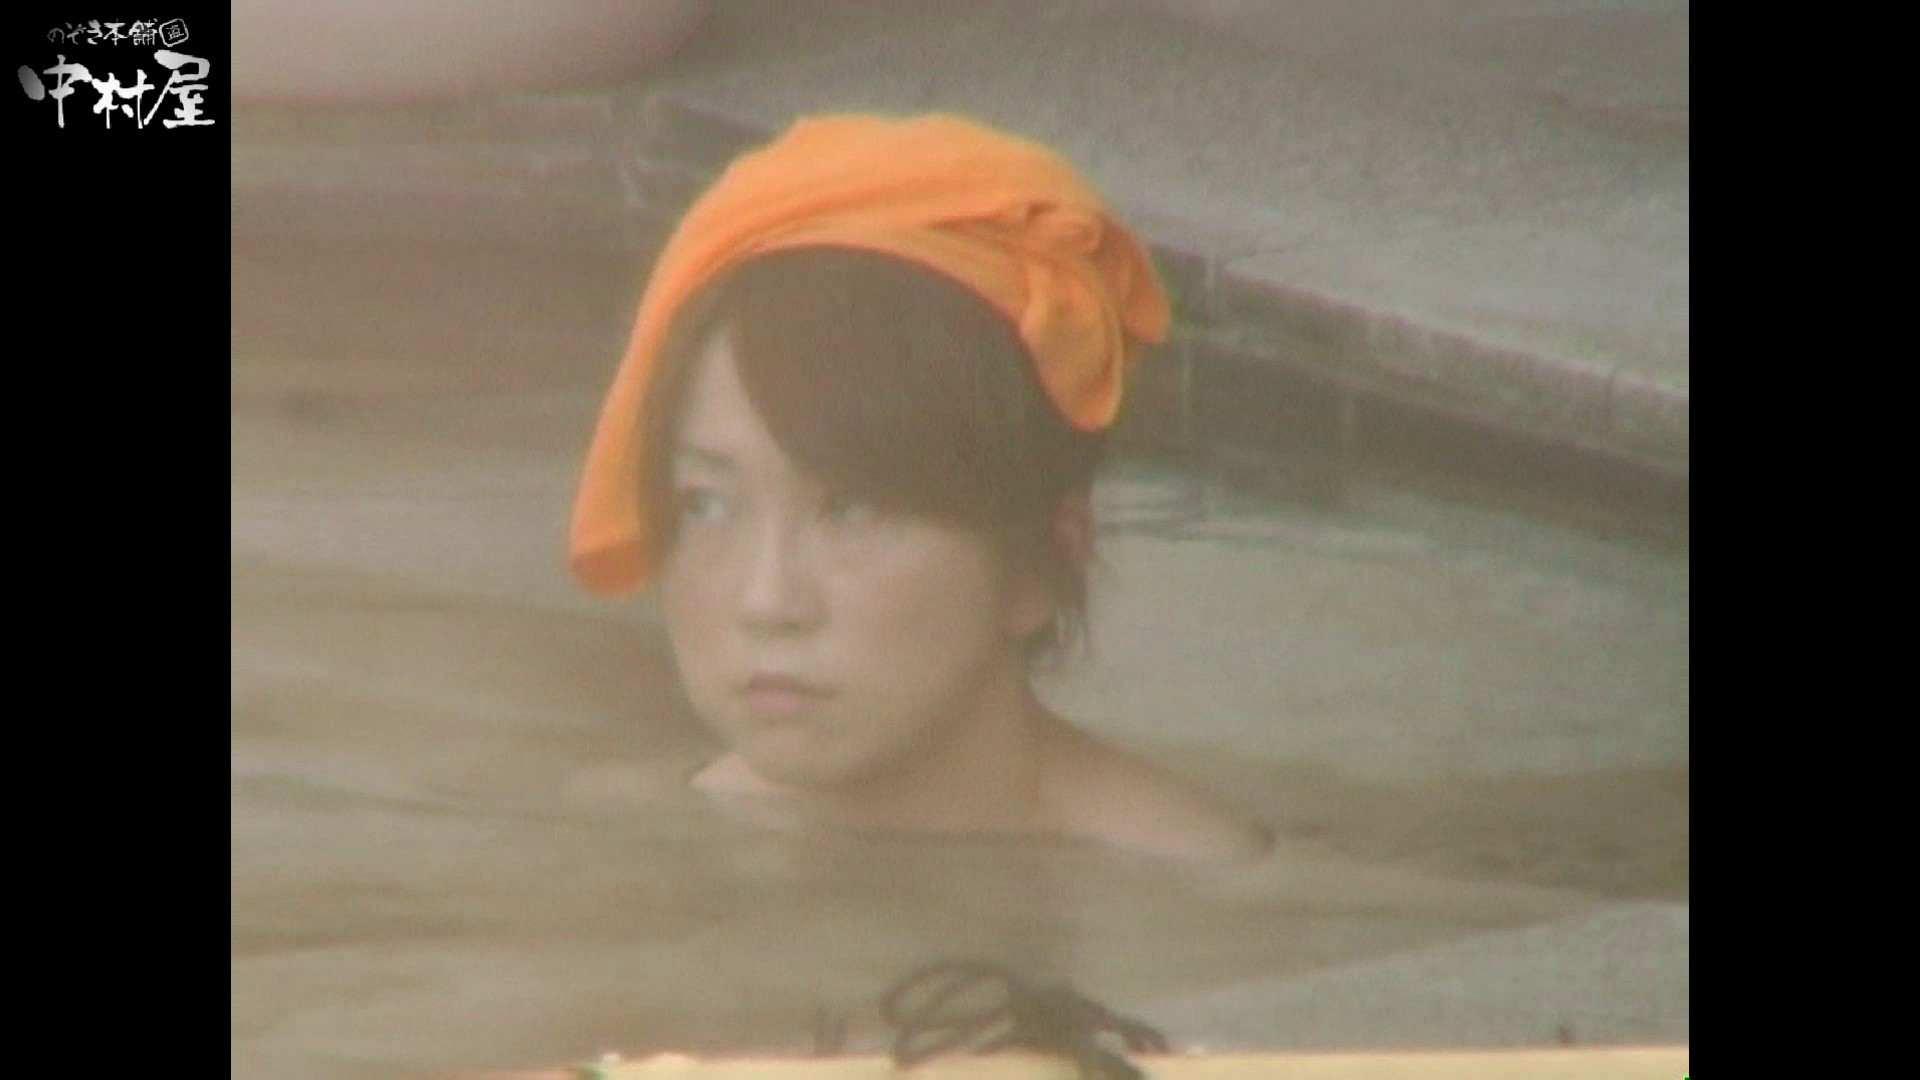 Aquaな露天風呂Vol.941 OLセックス   盗撮  49画像 28